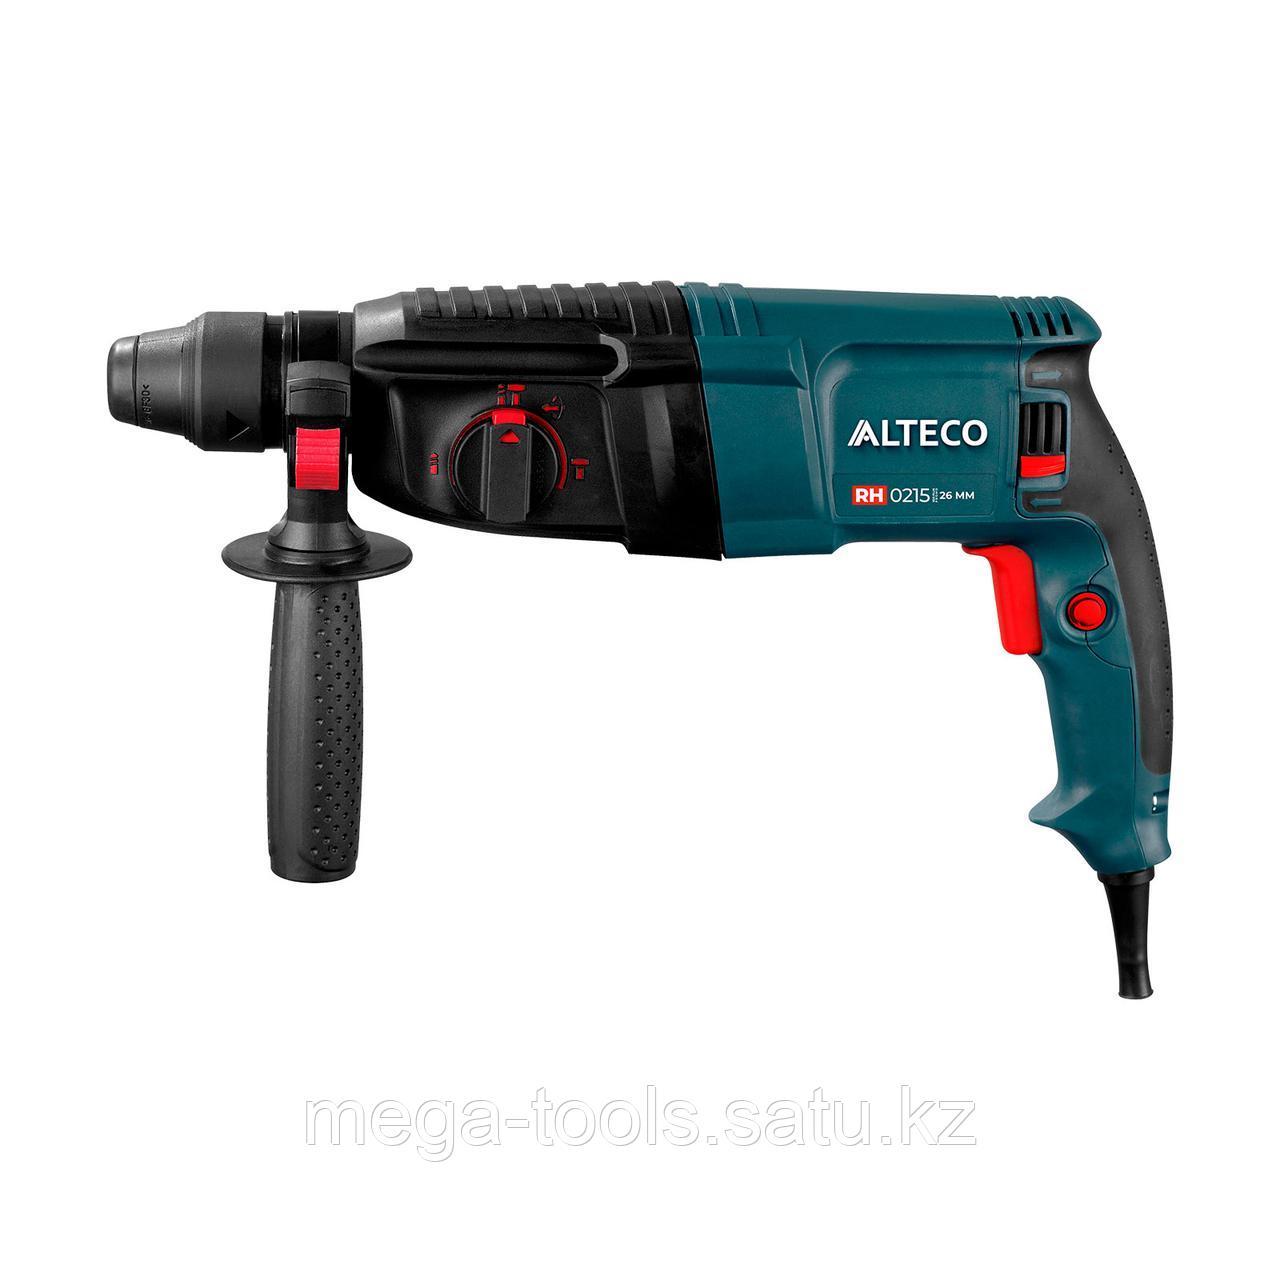 Перфоратор Alteco RH 0215 SDS-Plus Promo, 26 мм